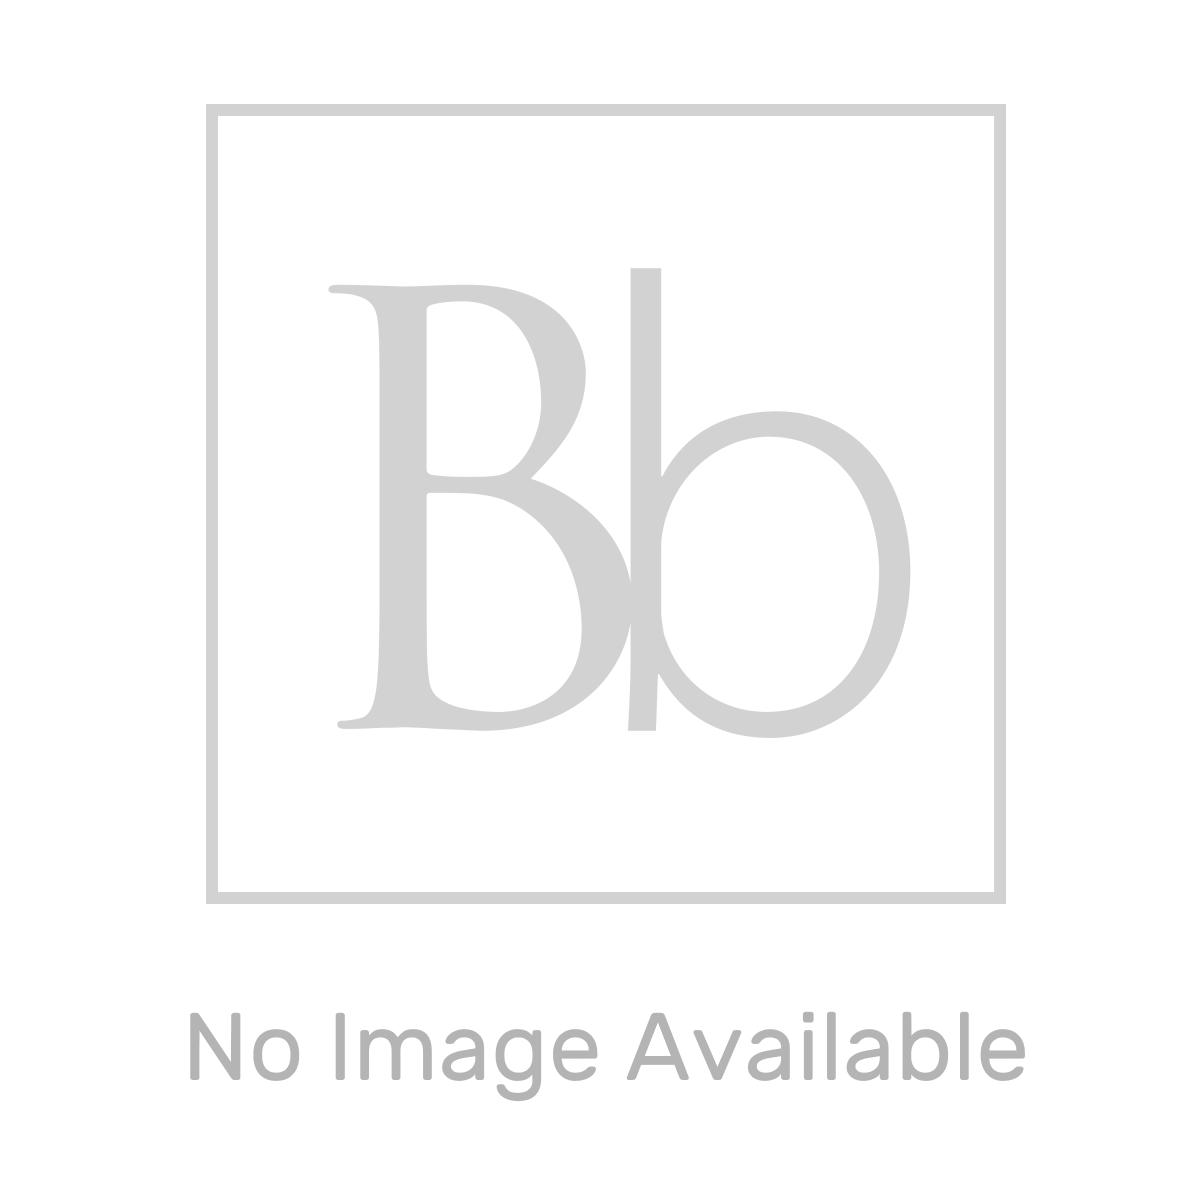 Hudson Reed Quartet Grey Gloss 3 Door Mirror Cabinet 1350mm line drawing